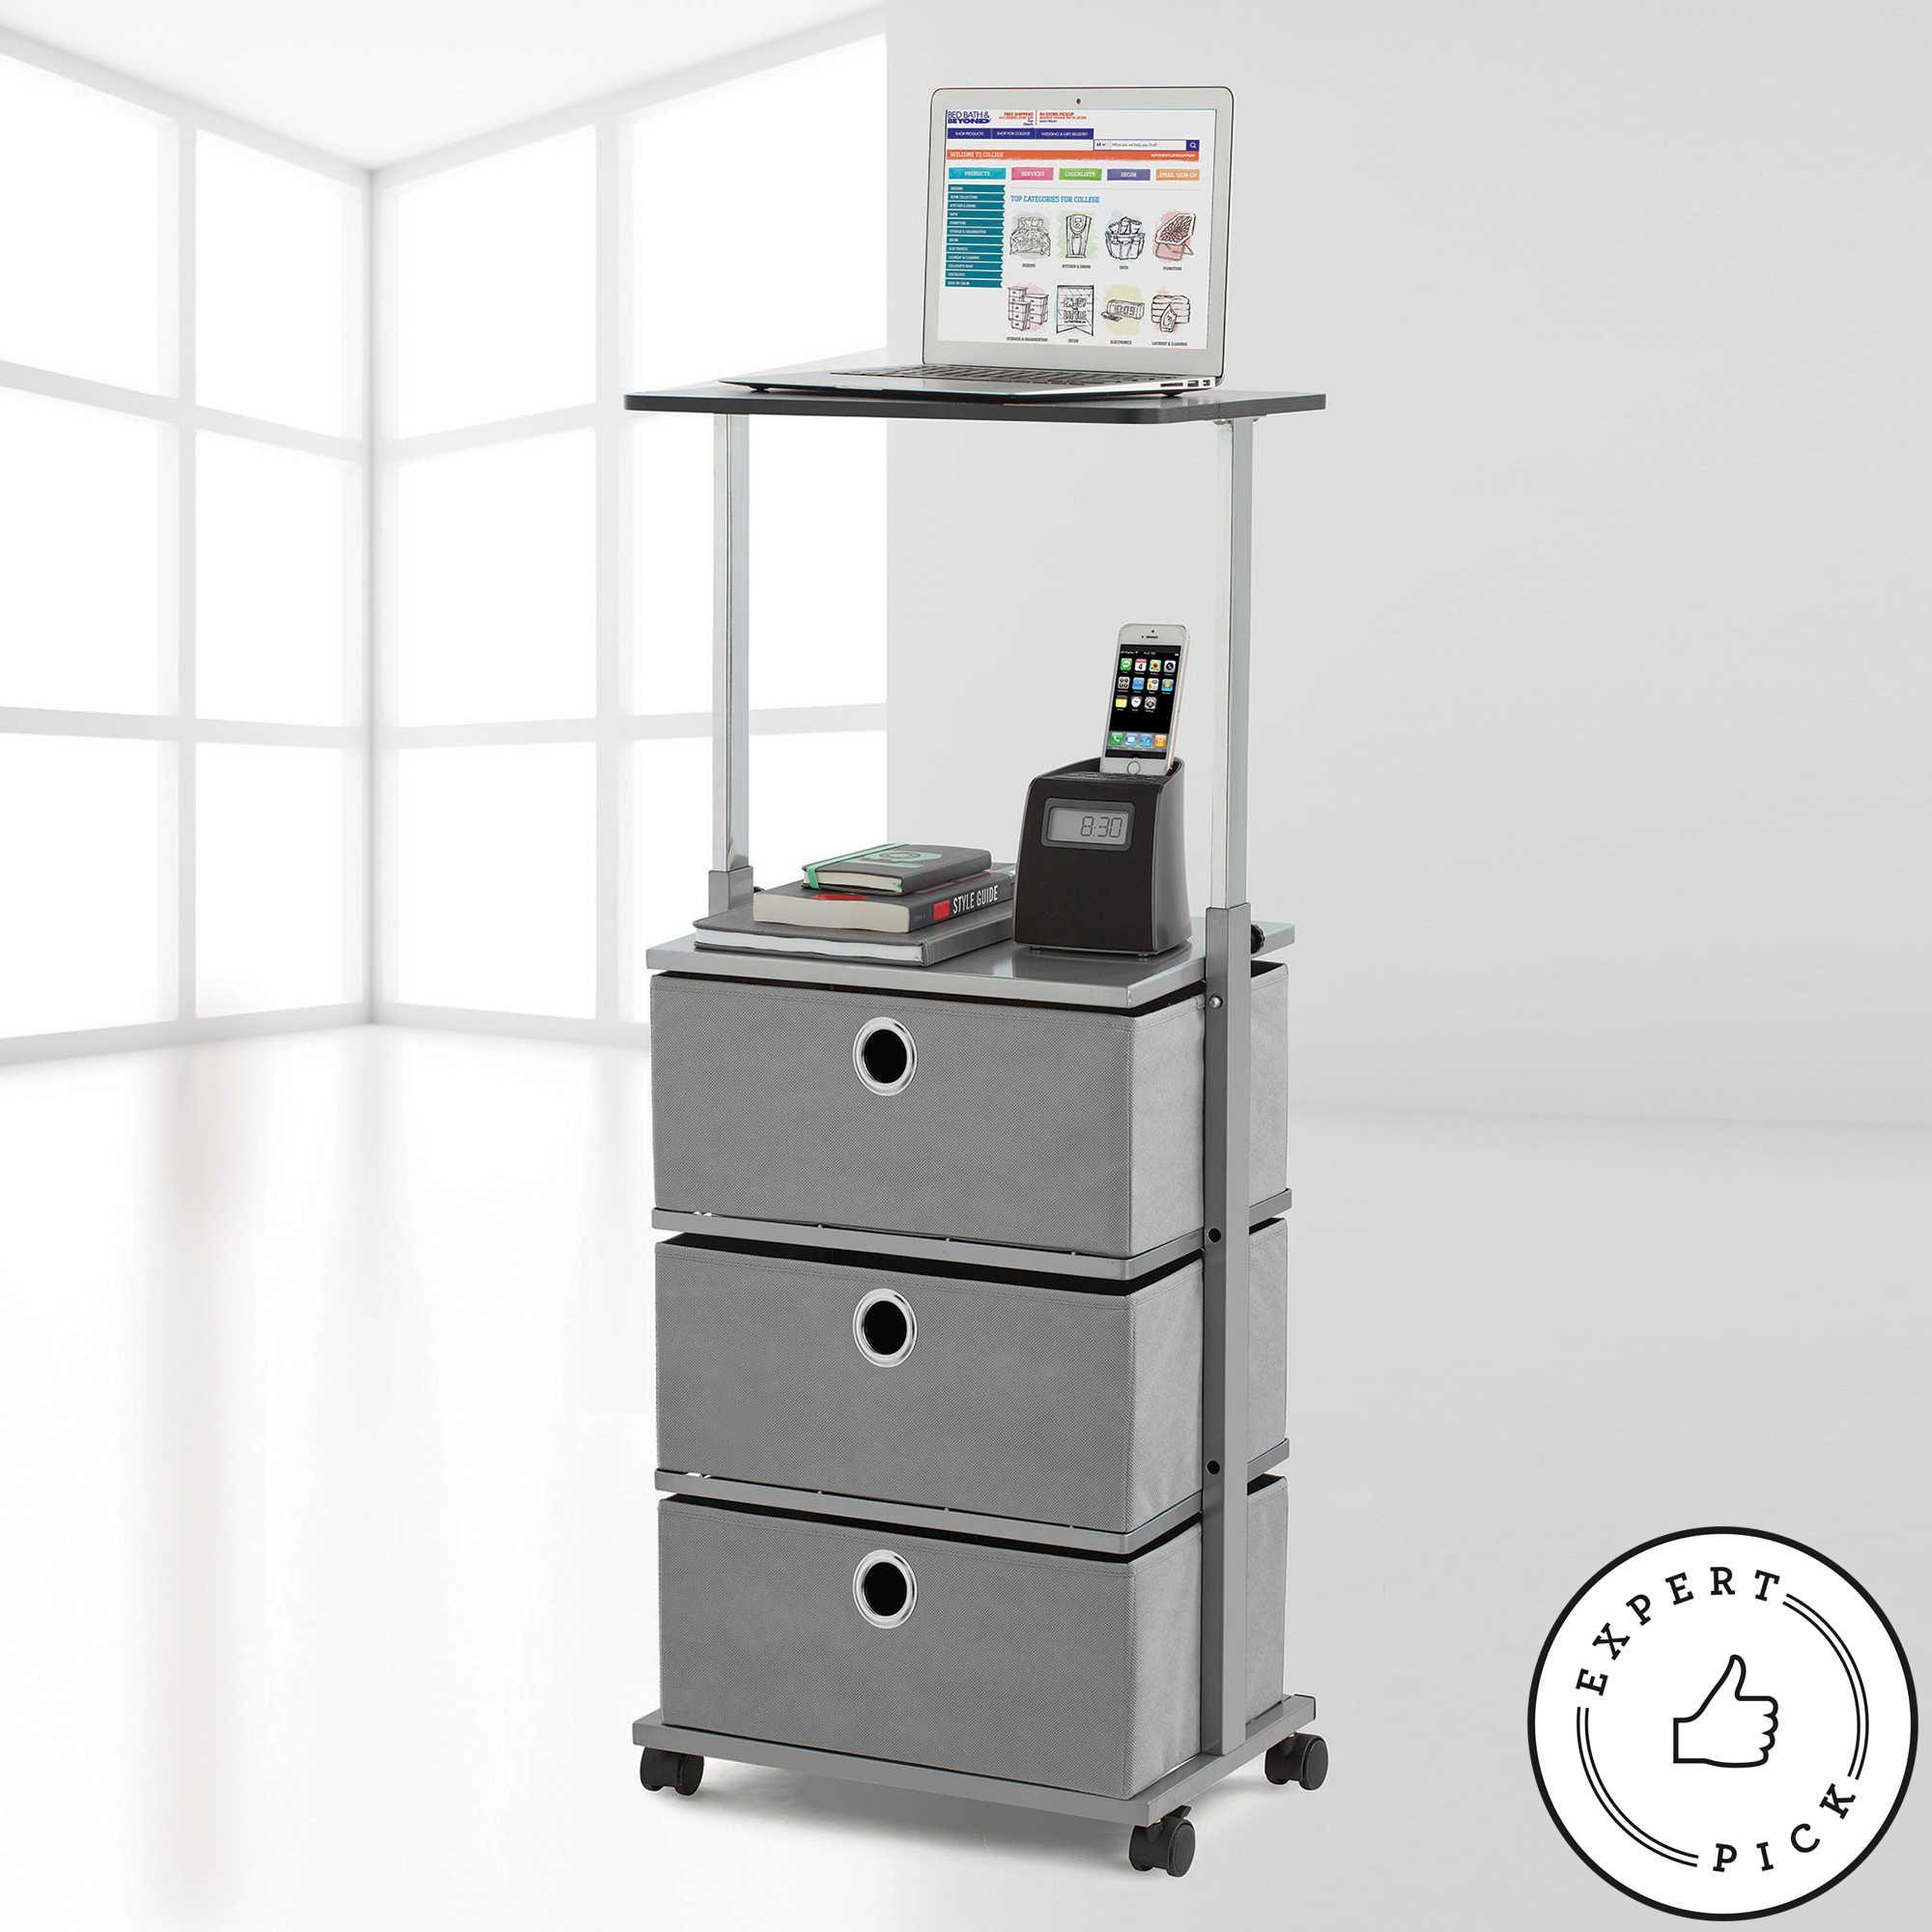 storage wid with iris p drawers qlt hei cart prod top drawer organizer spin